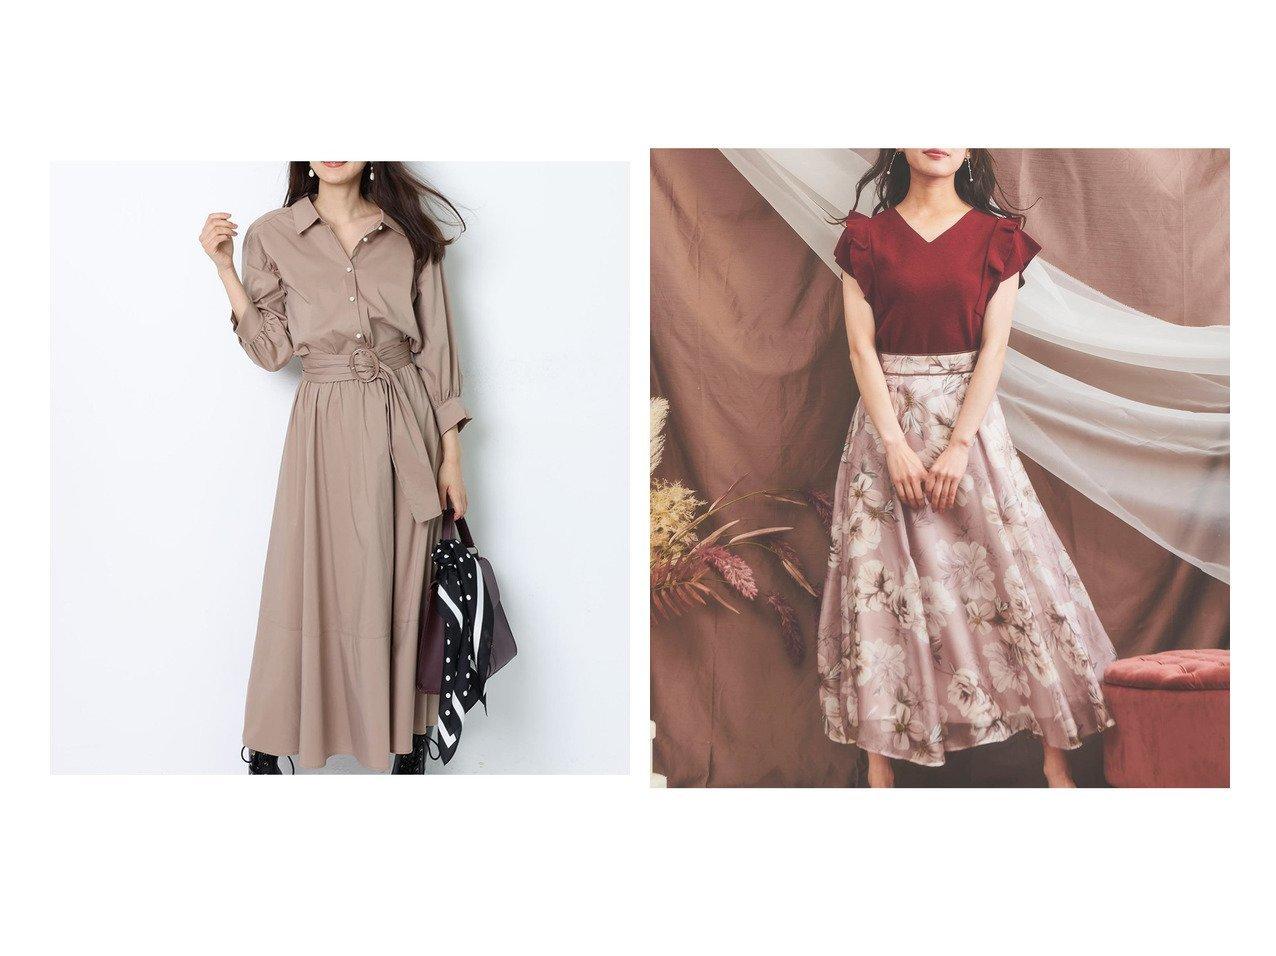 【Noela/ノエラ】のシャインフラワープリントスカート&【JUSGLITTY/ジャスグリッティー】のパール釦シャツ×スカートSET 【スカート】おすすめ!人気、トレンド・レディースファッションの通販 おすすめで人気の流行・トレンド、ファッションの通販商品 インテリア・家具・メンズファッション・キッズファッション・レディースファッション・服の通販 founy(ファニー) https://founy.com/ ファッション Fashion レディースファッション WOMEN セットアップ Setup トップス Tops スカート Skirt スカート Skirt Aライン/フレアスカート Flared A-Line Skirts NEW・新作・新着・新入荷 New Arrivals セットアップ パール フェミニン フレア ロング ギャザー シフォン プリント |ID:crp329100000066656